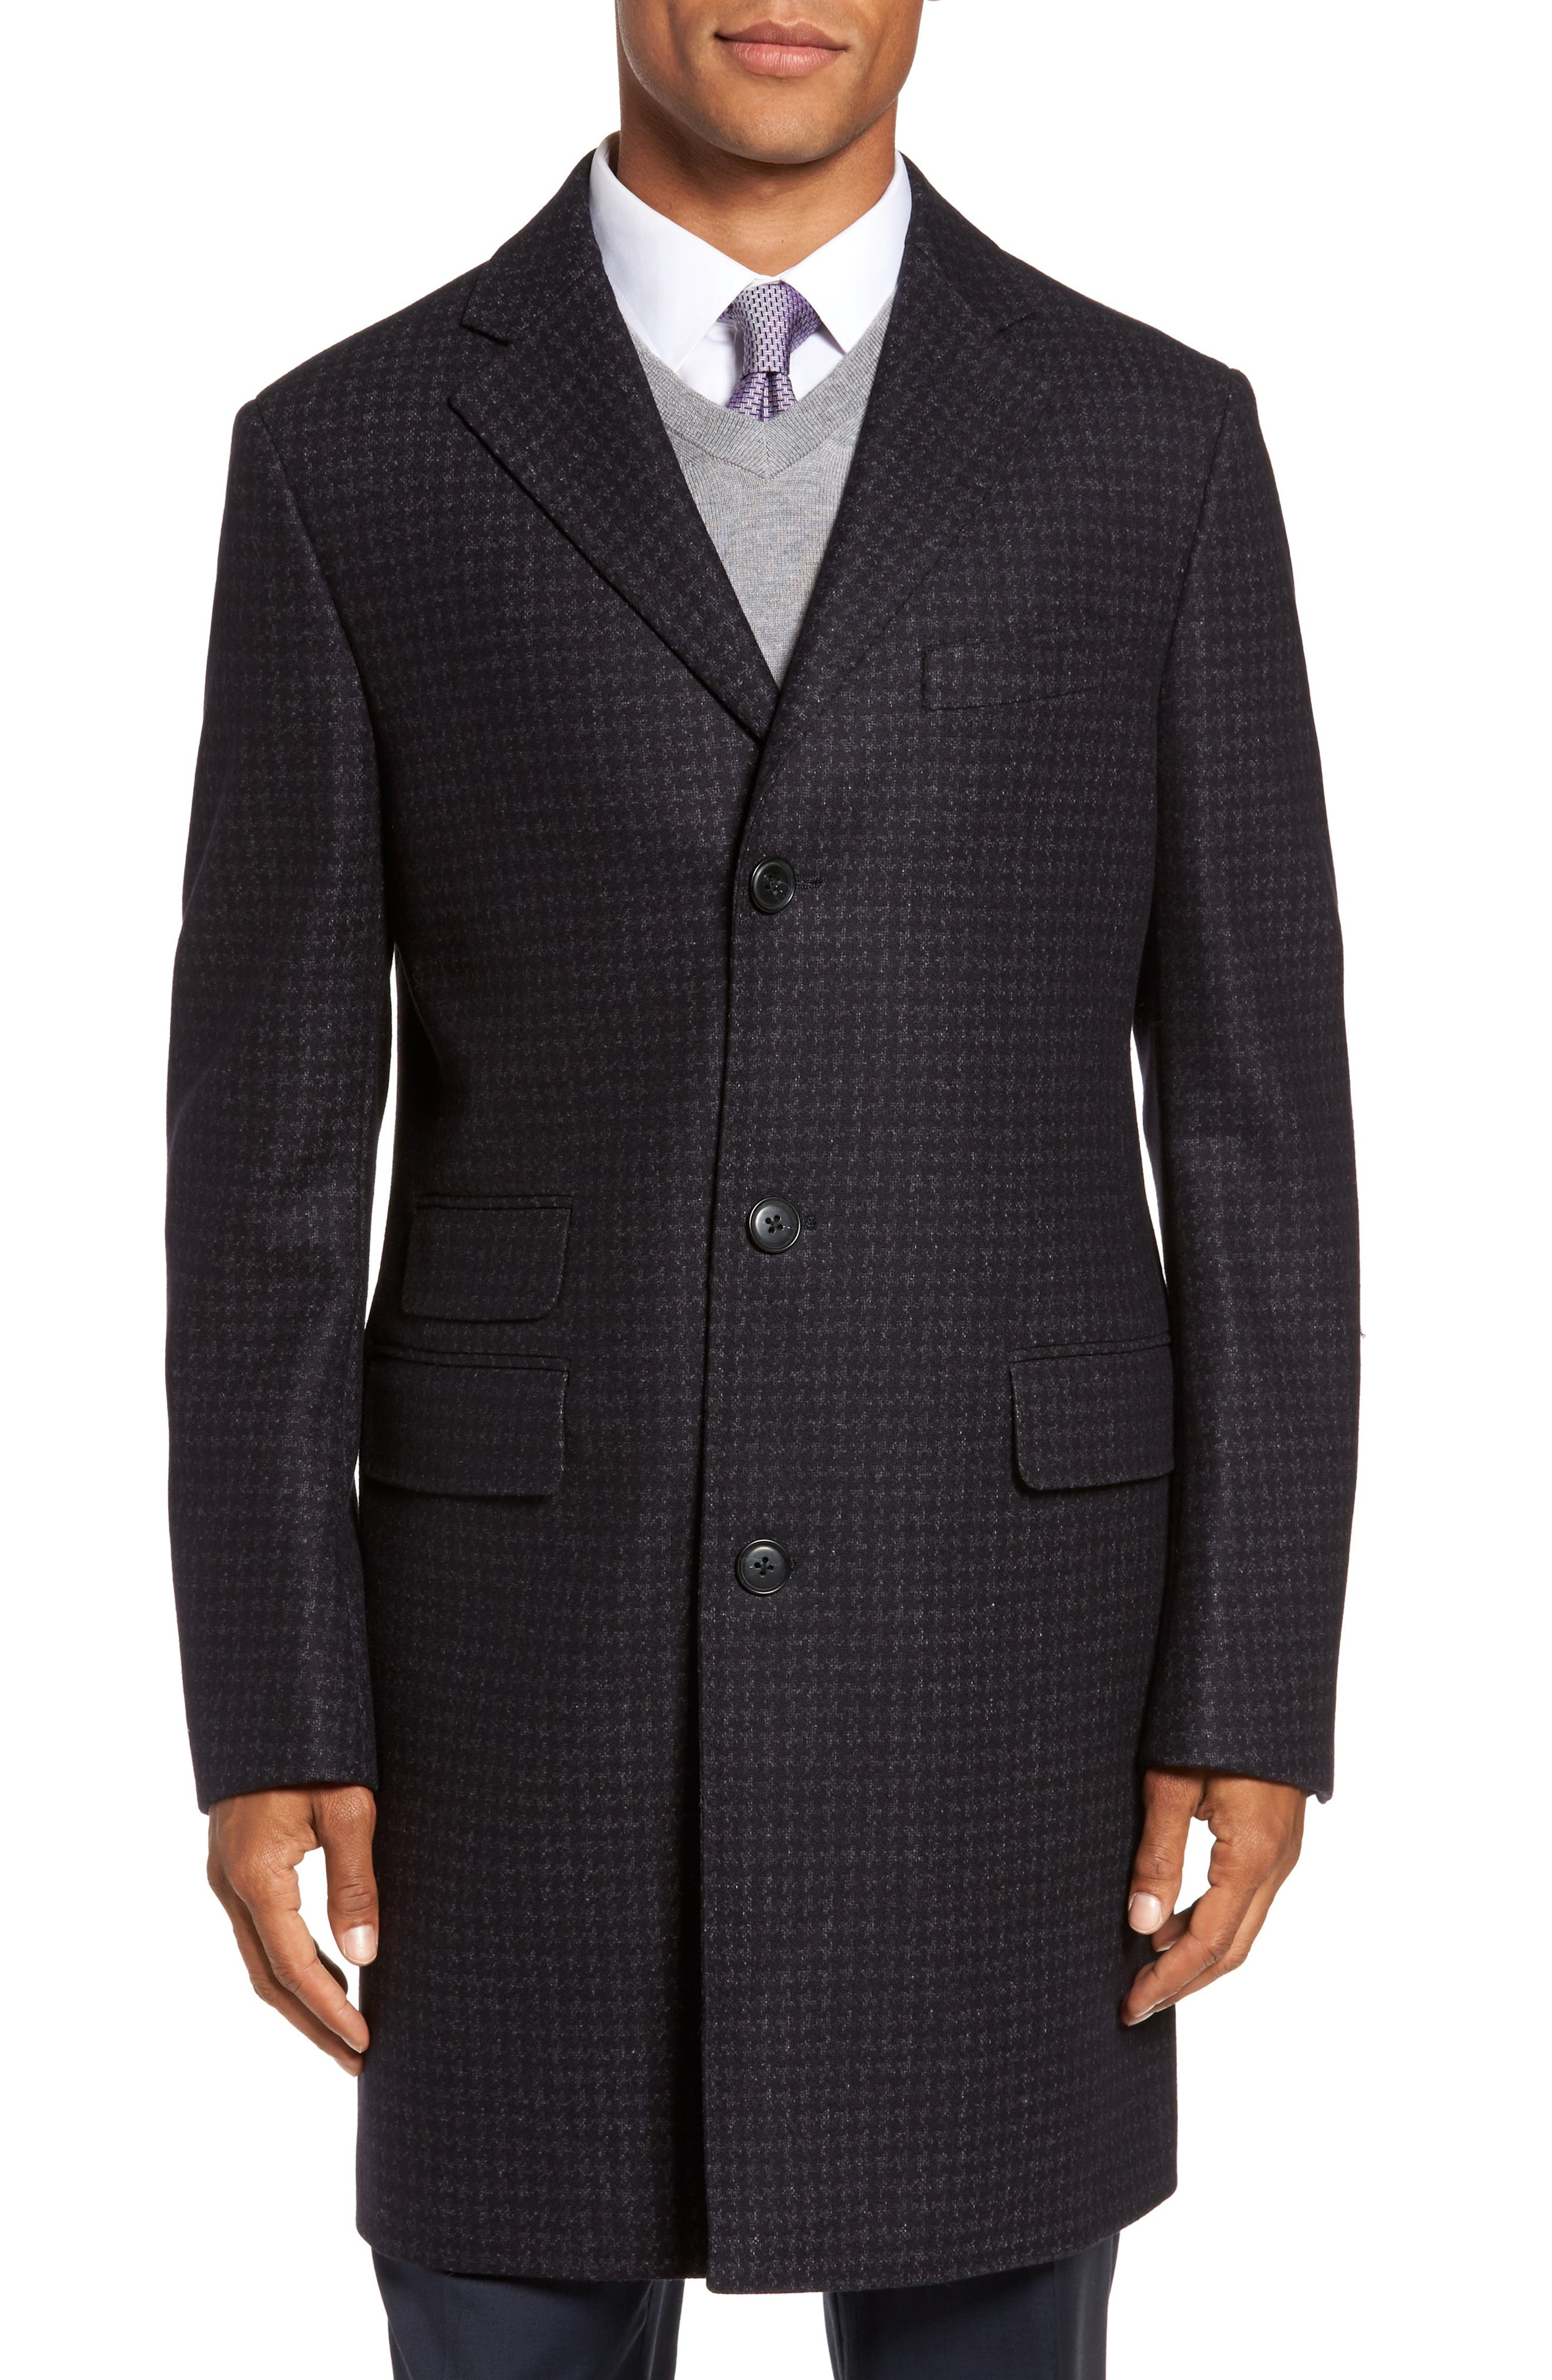 Jackson Houndstooth Wool Blend Overcoat,                             Alternate thumbnail 4, color,                             410